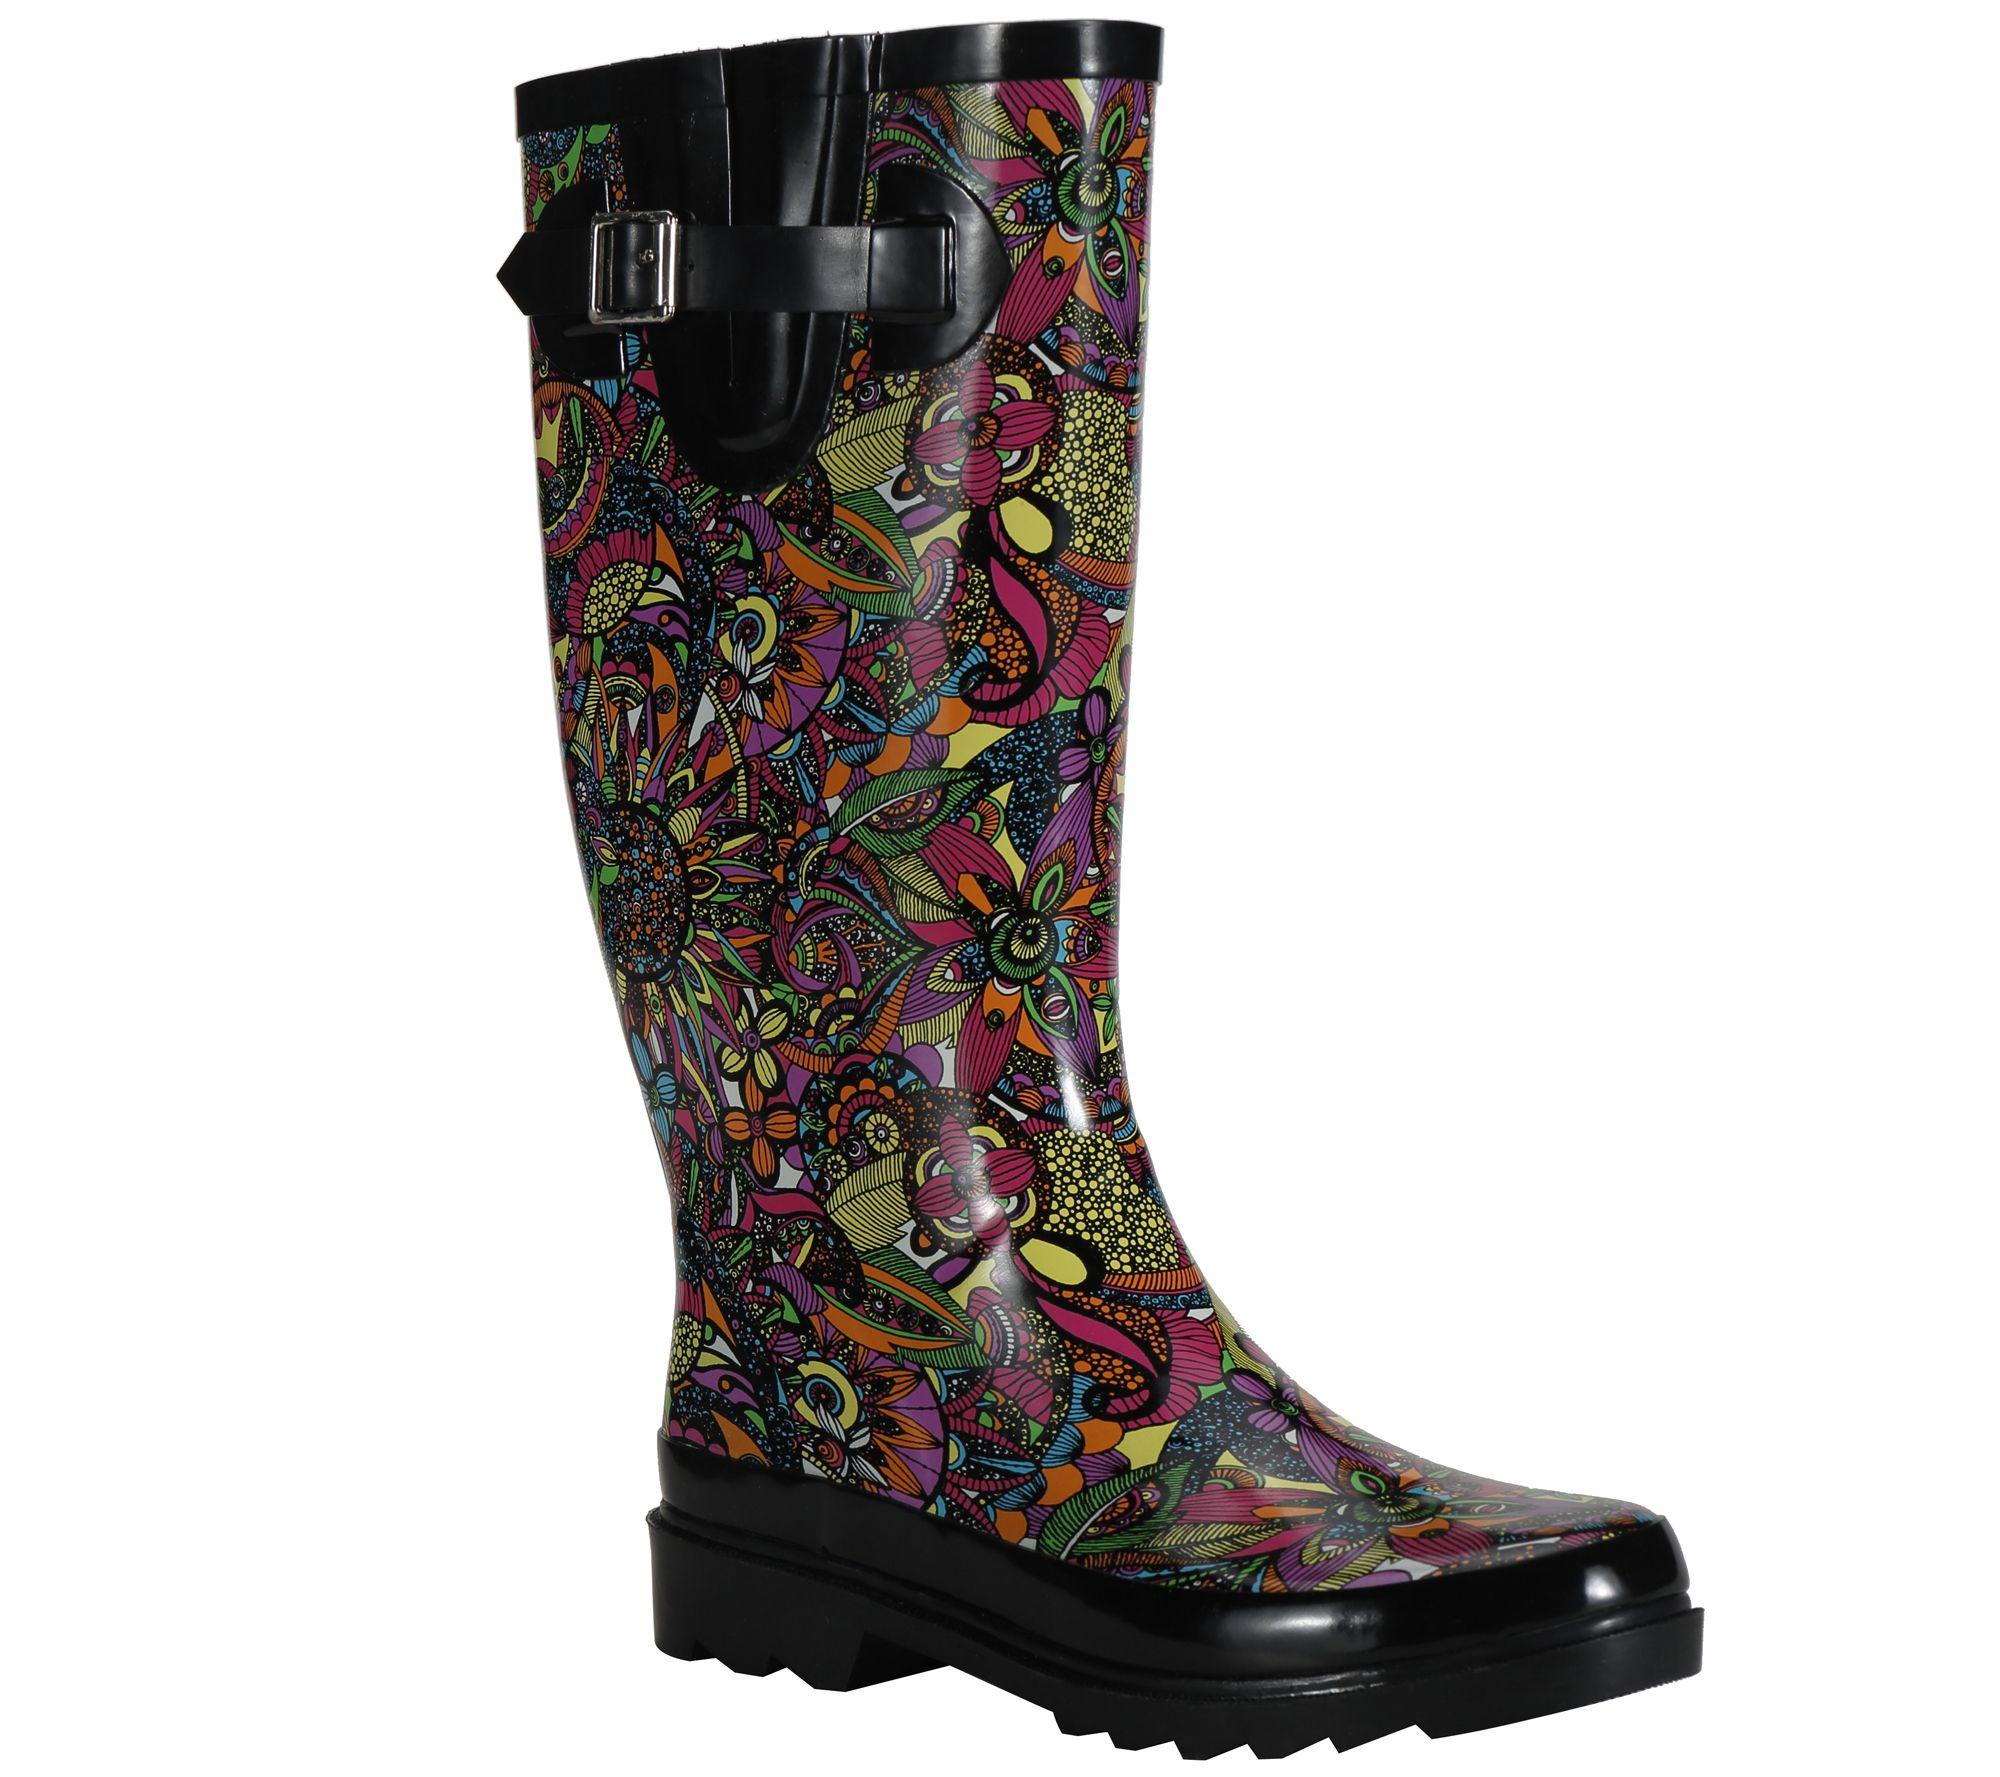 d16efd0b8 Sakroots Rain Boots - Rhythm - Page 1 — QVC.com